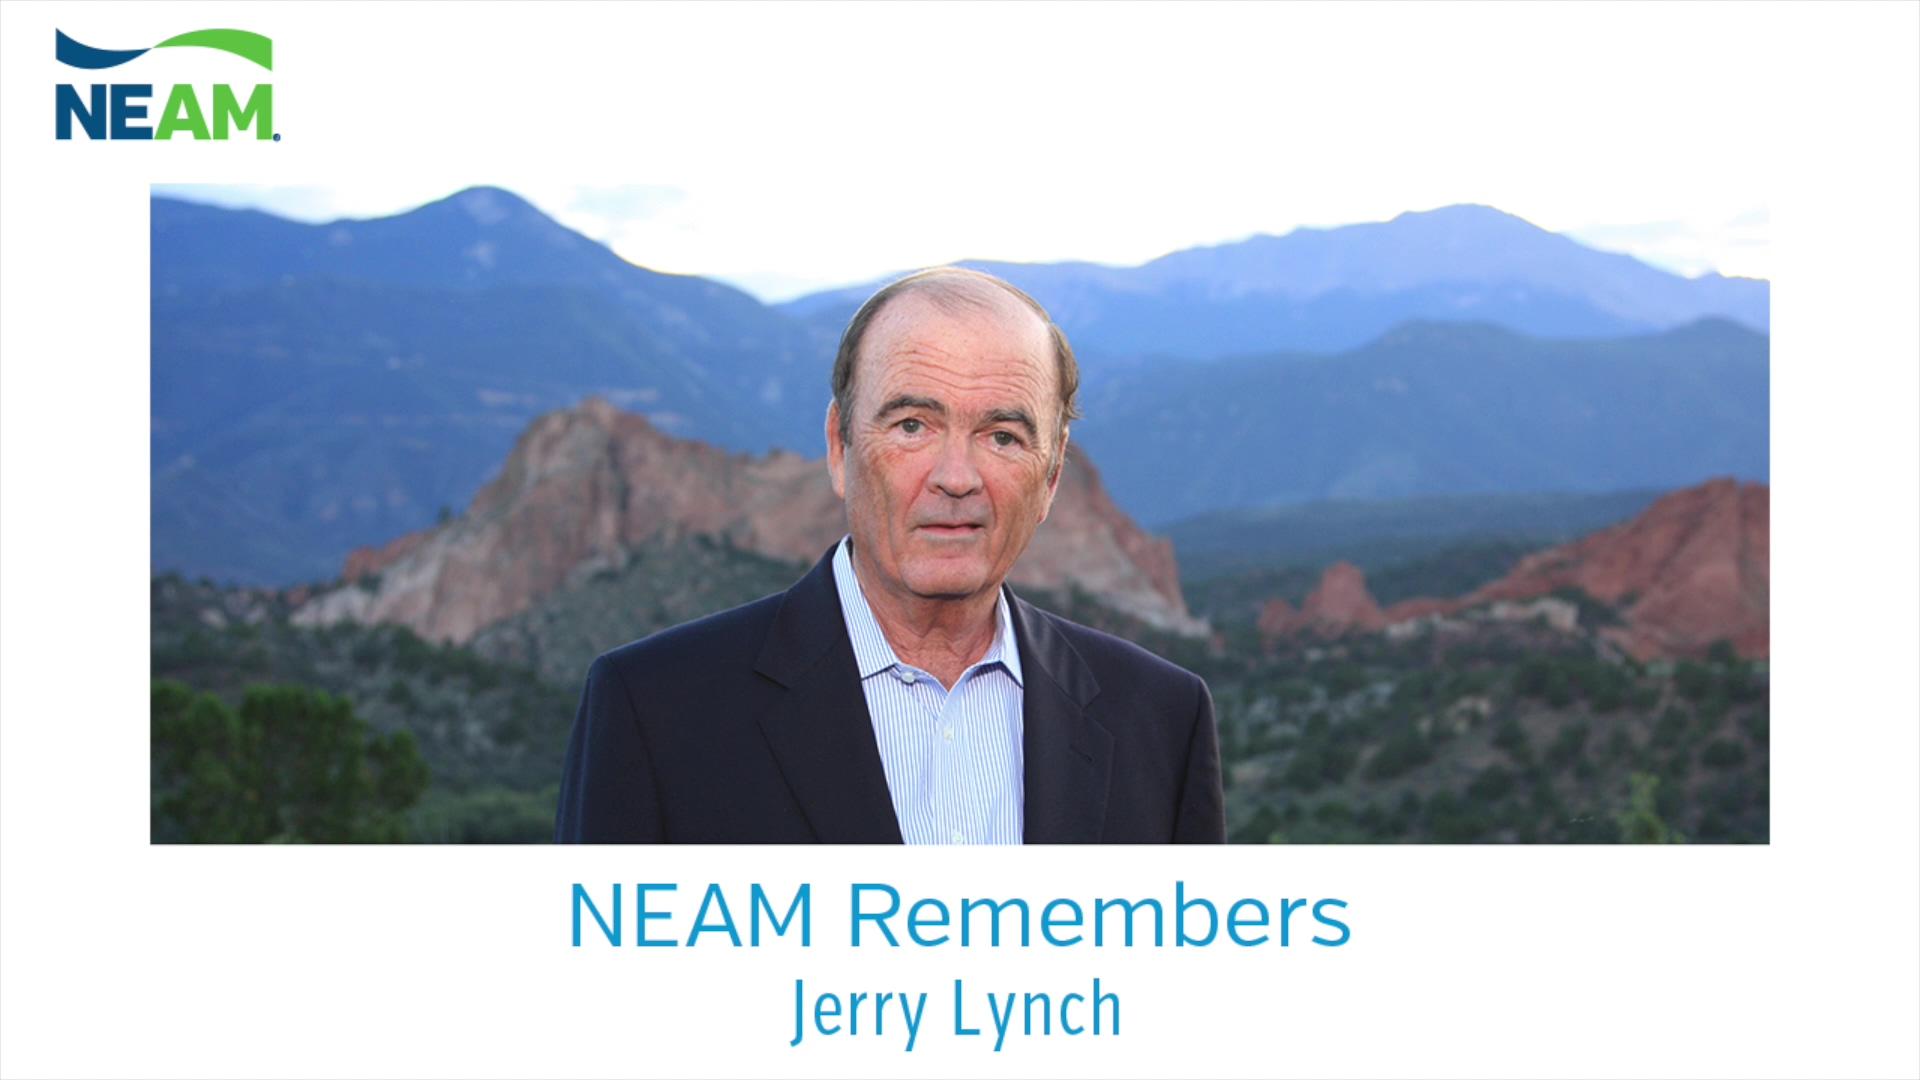 NEAM Remembers_v3